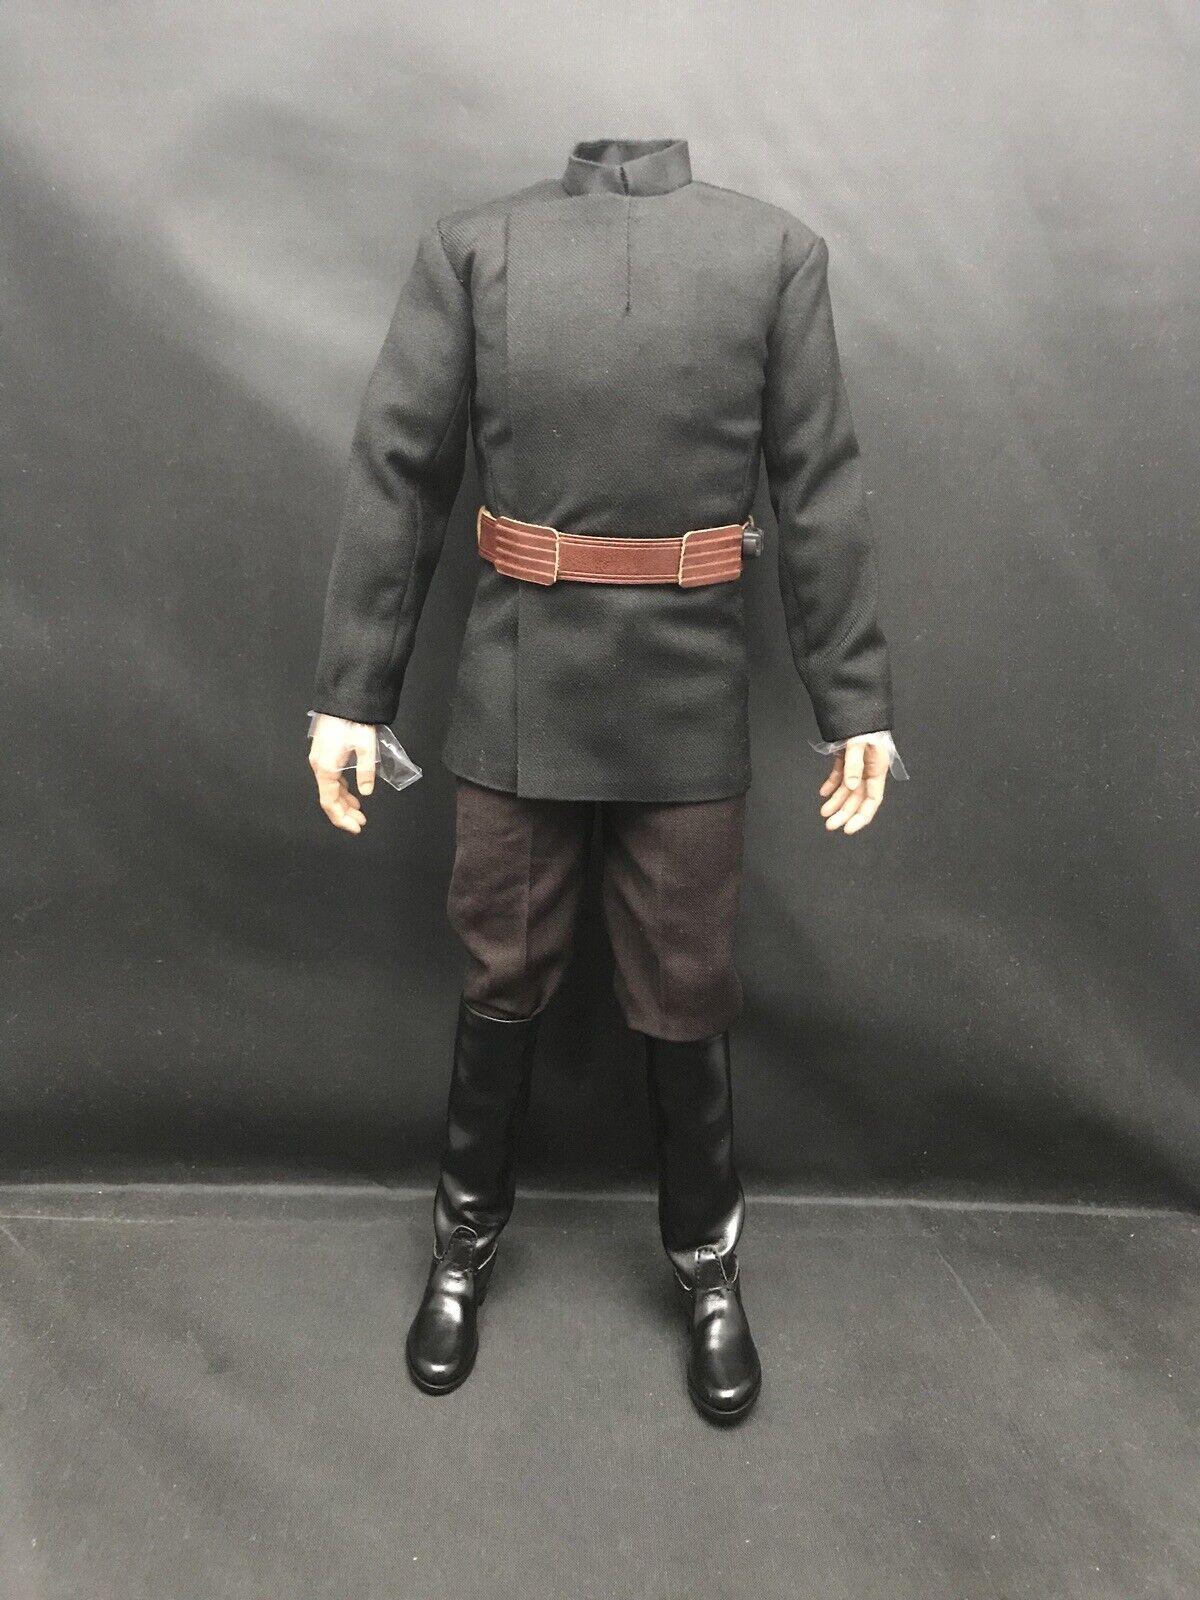 caliente giocattoli MMS496 16 estrella guerras Attack of the Clones Count Dooku  corpo & Outfit